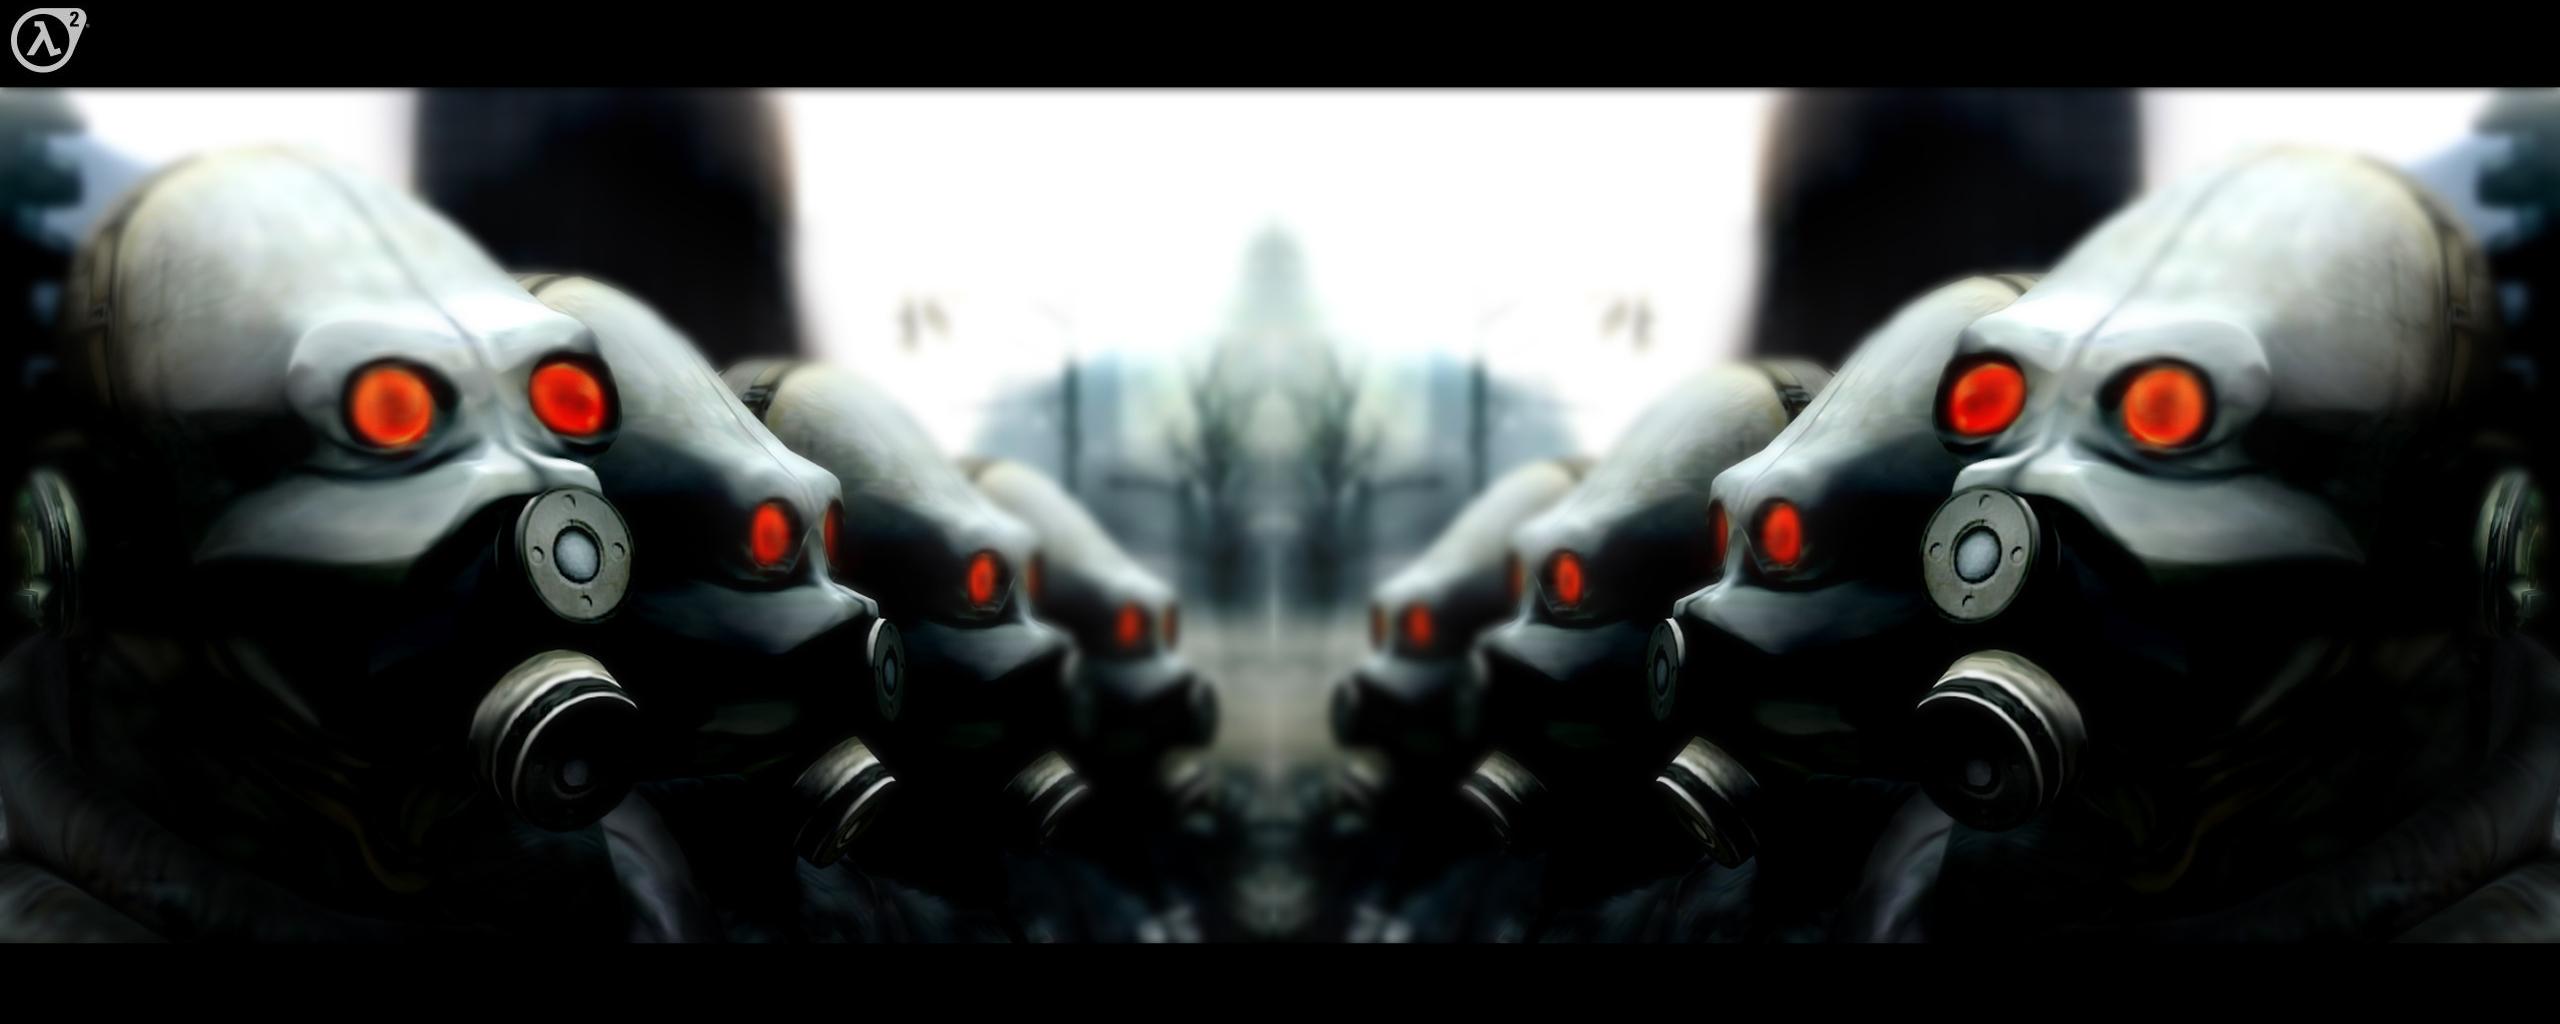 Multi Monitor - Videospiel  Halflife Life Half Wallpaper